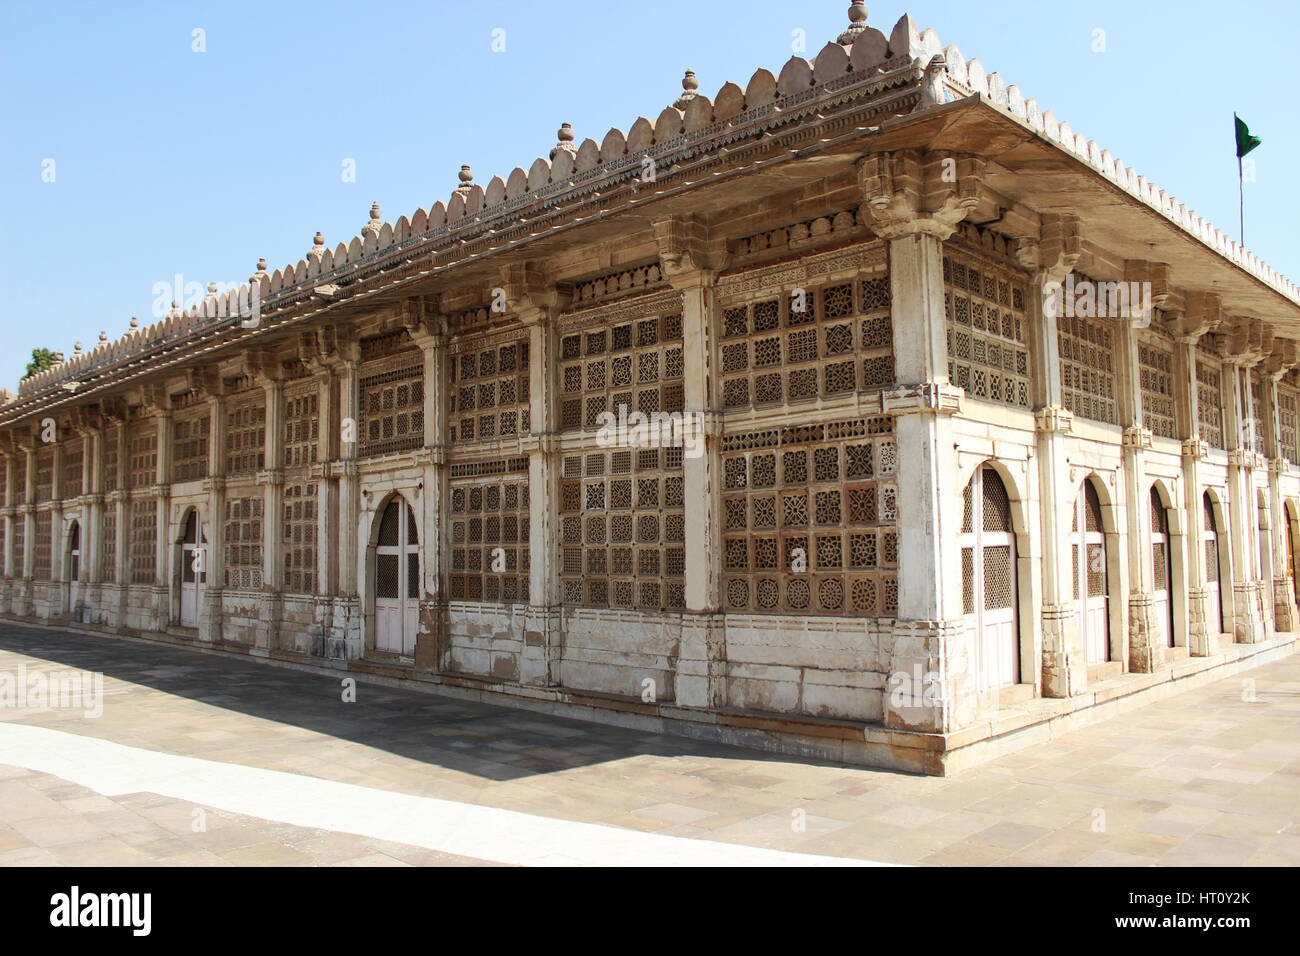 Exterior of Sarkhej Roza mosque in Ahmedabad, Gujarat, India - Stock Image